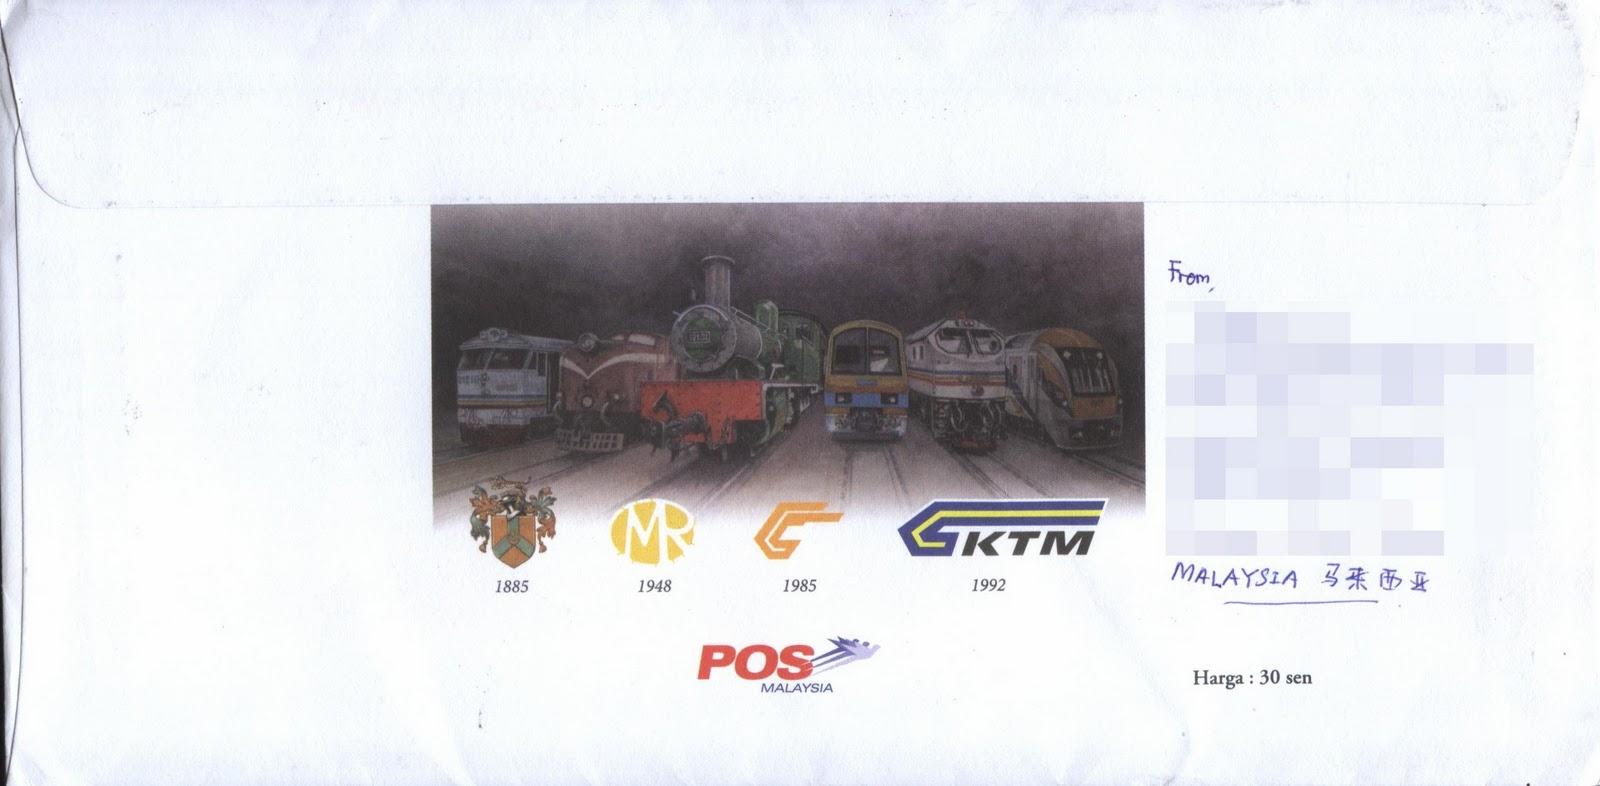 61love 明信片Postcrossing: [馬來西亞Malaysia] 0366 吉隆坡的Philo